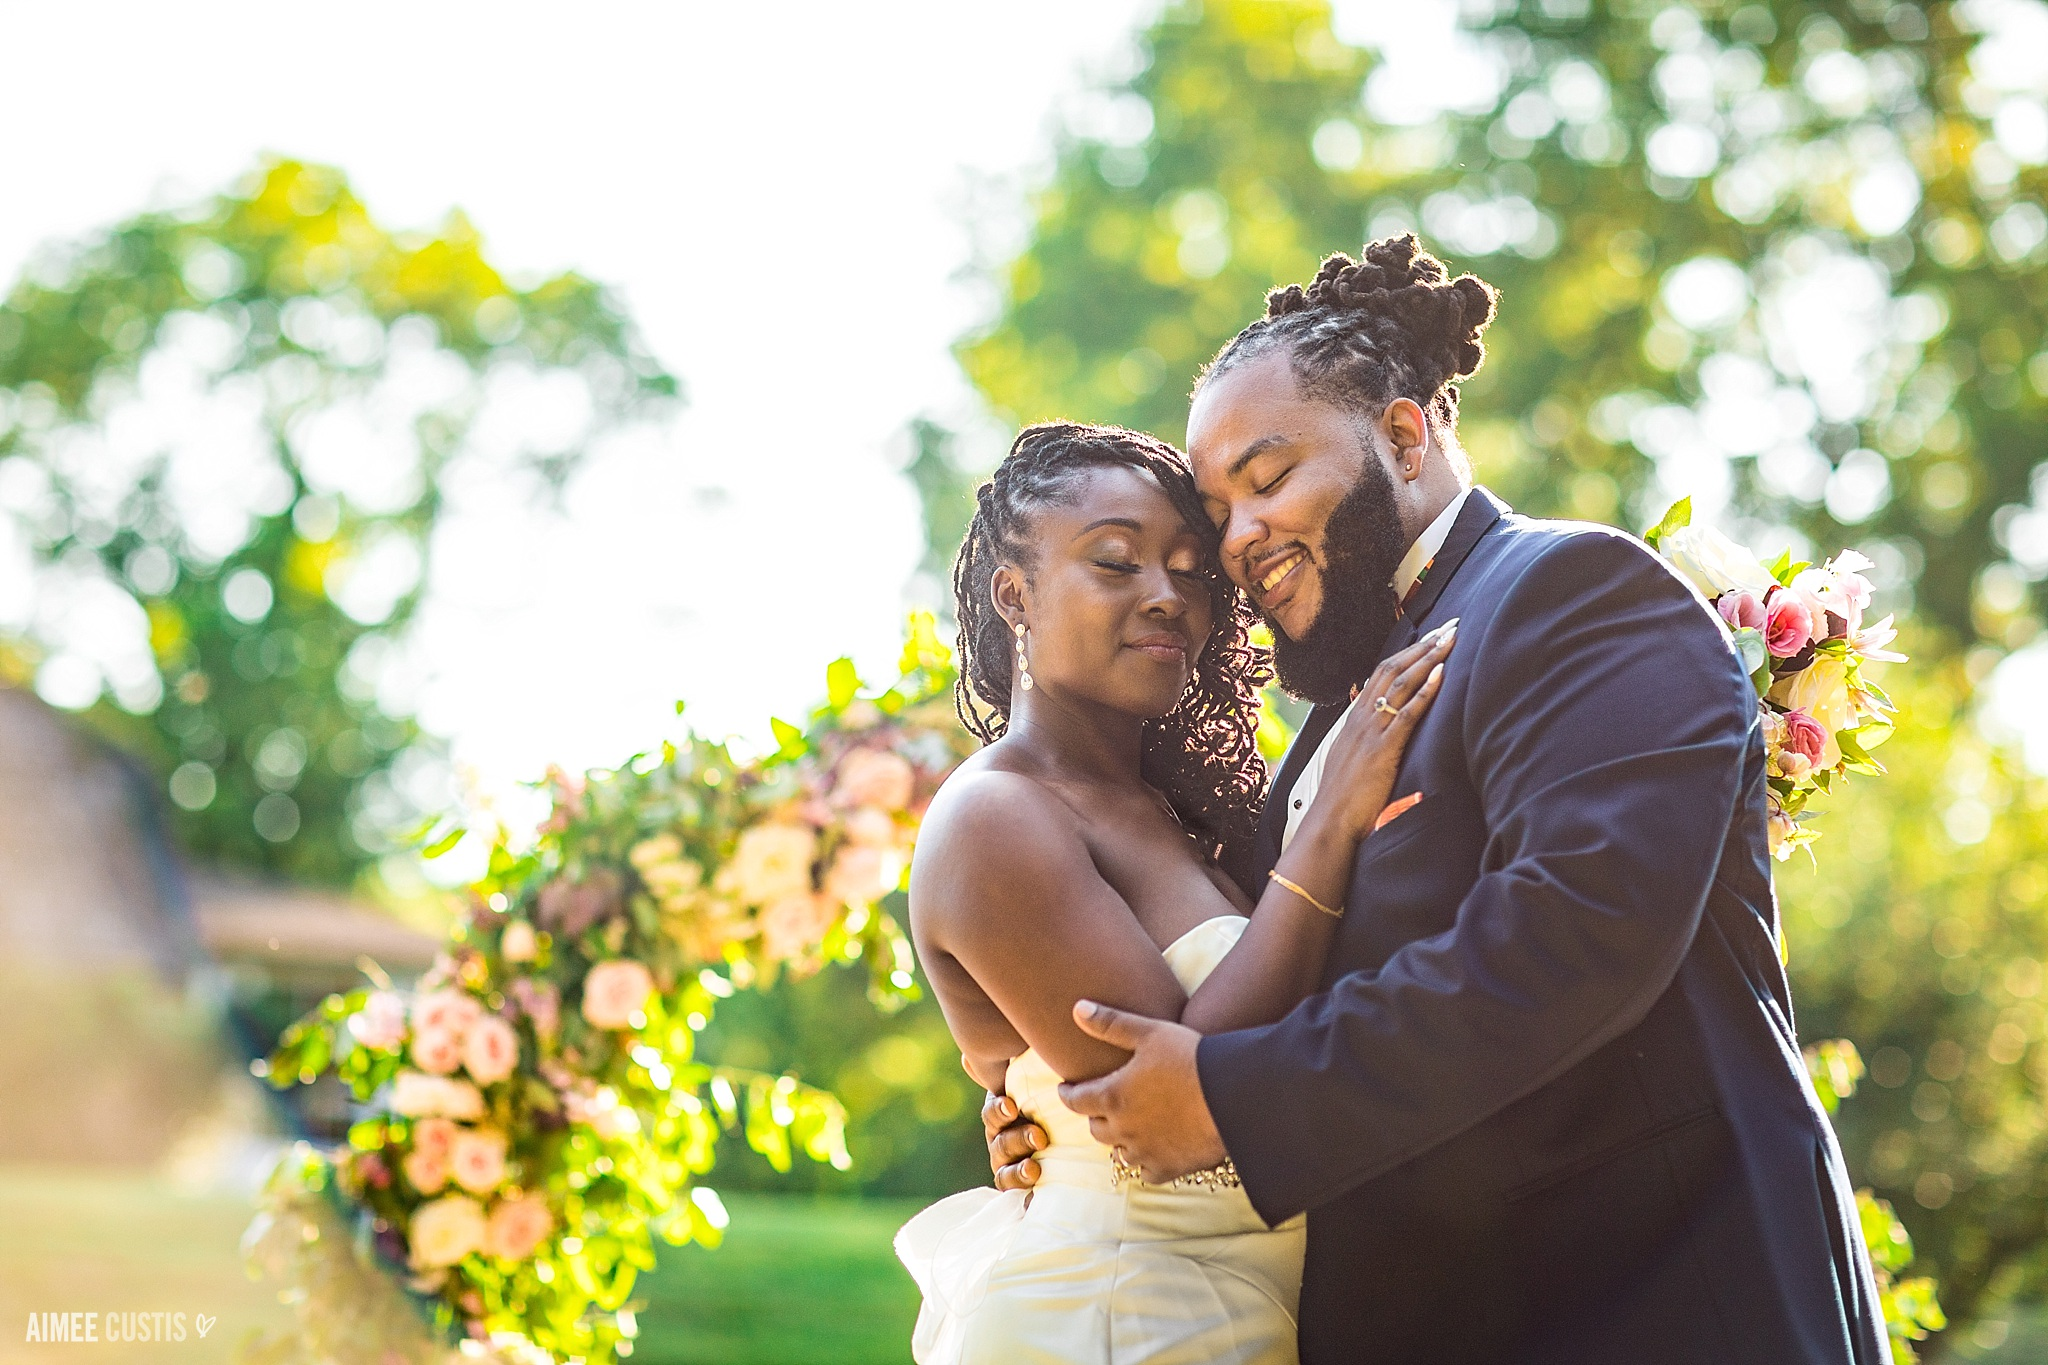 ACP_2090-Edit.jpgbest Washington DC wedding photographer people of color african ceremony